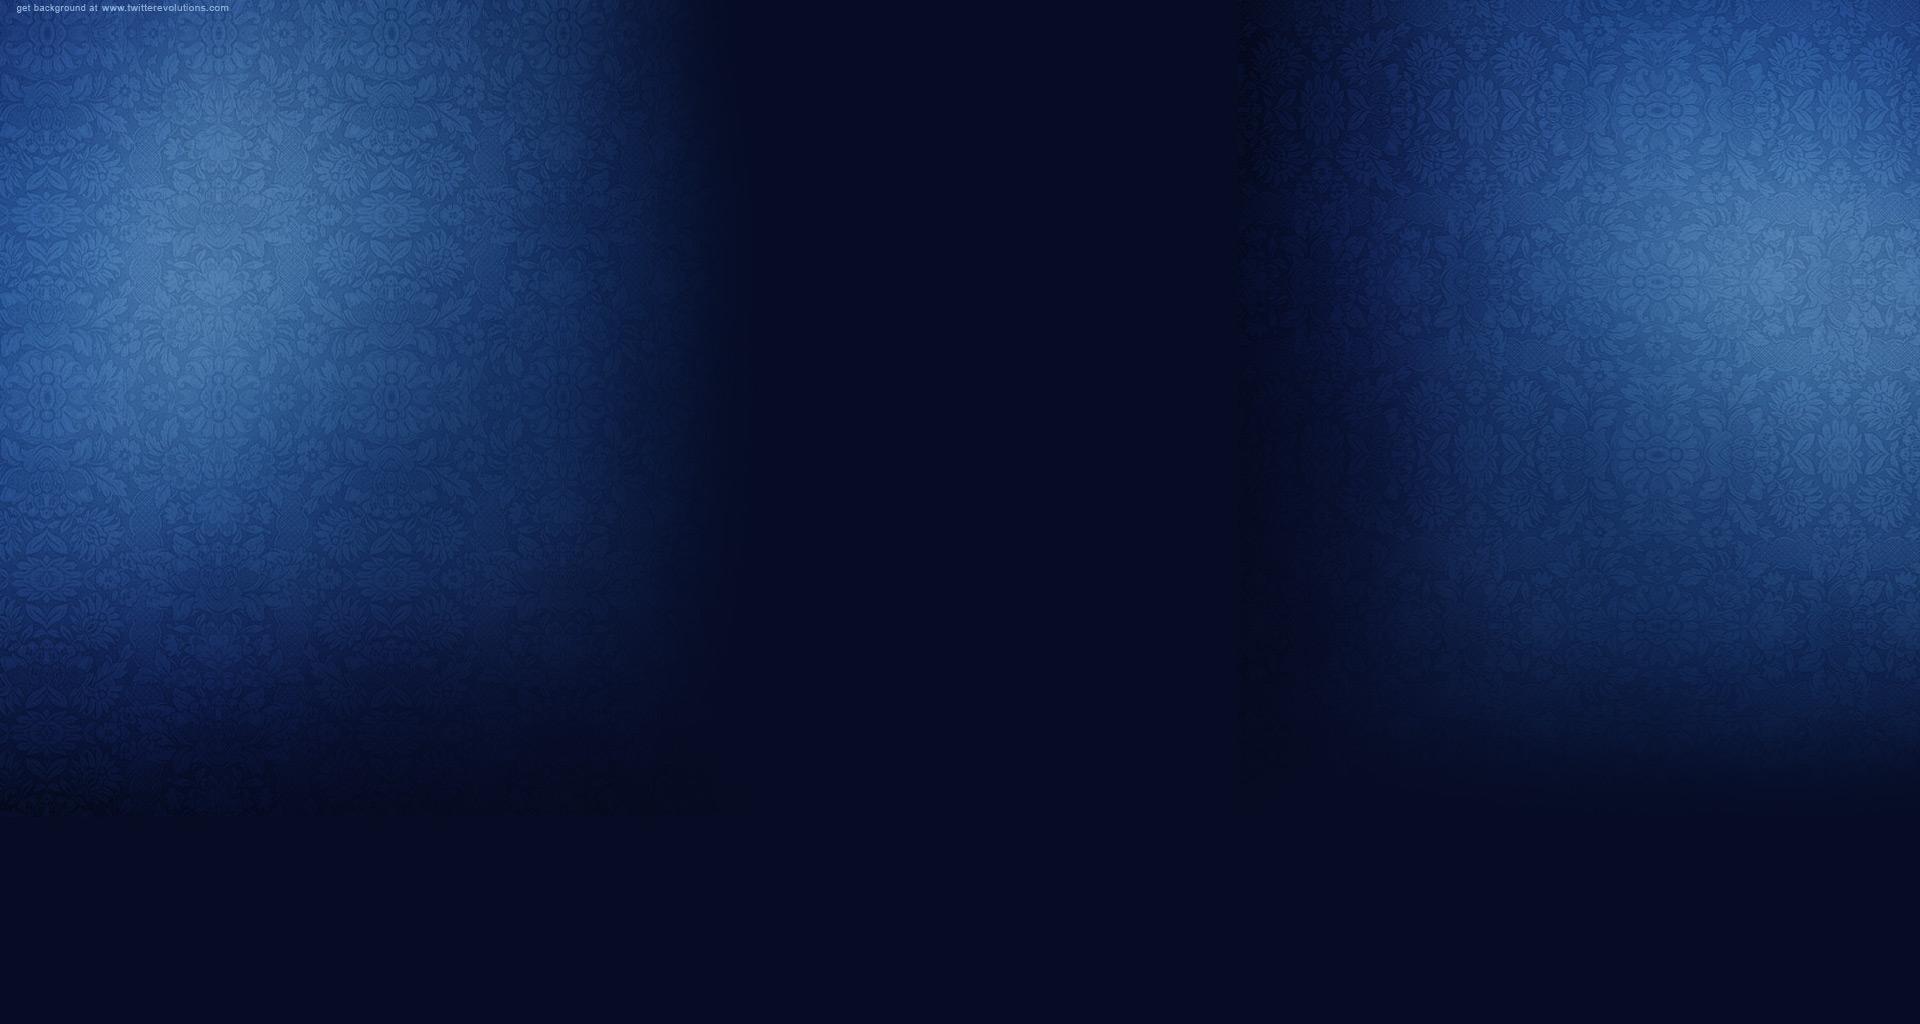 Blue wallpaper style Twitter background   Twitterevolutions 1920x1024